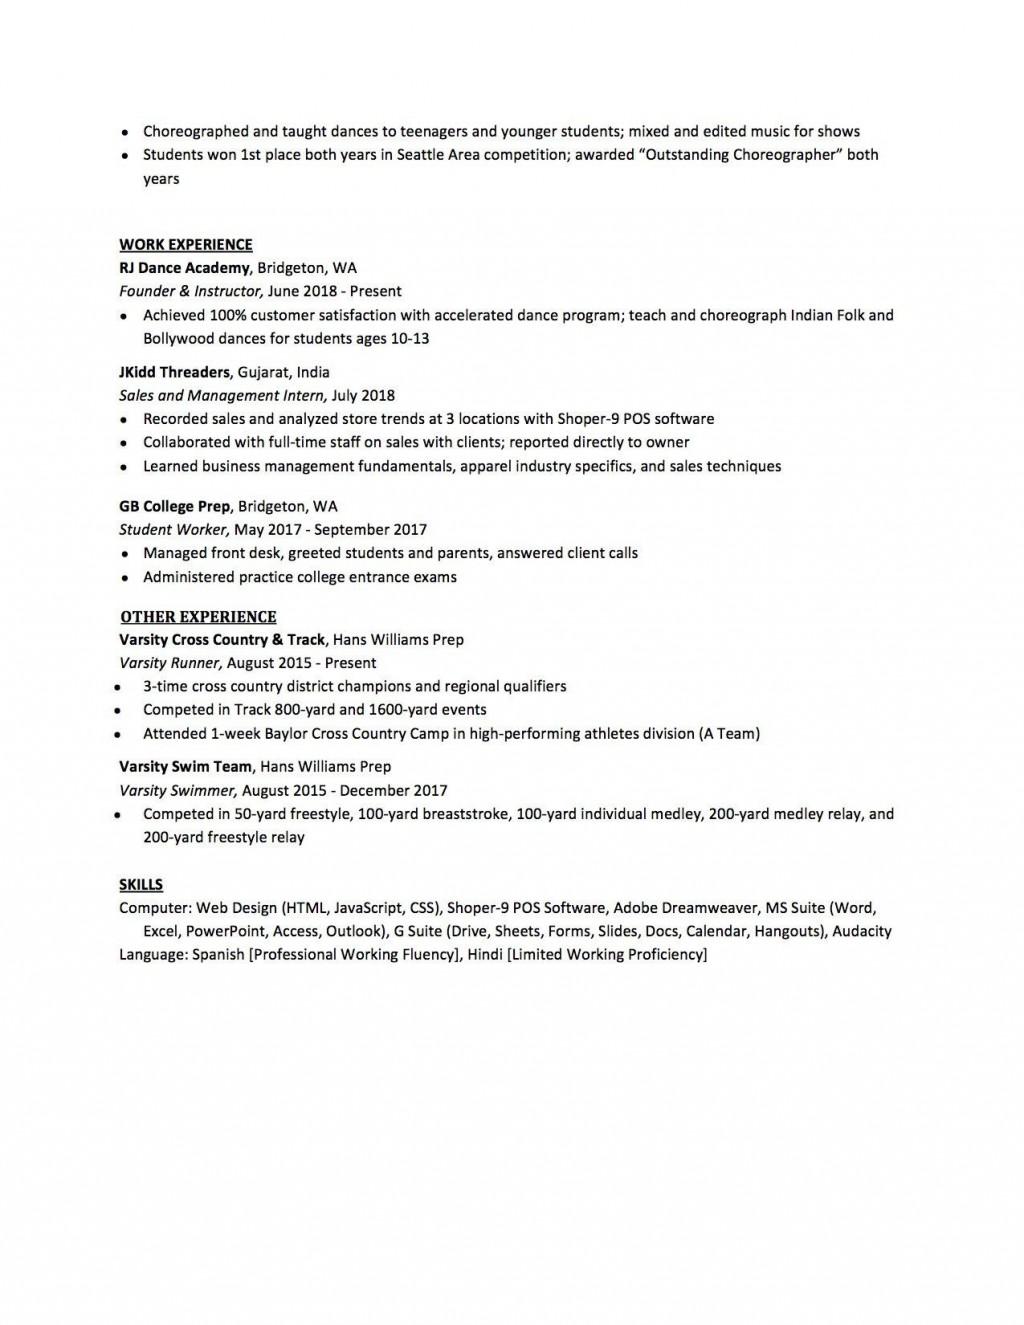 008 Simple Resume Template High School Photo  Student Australia For Google Doc Graduate Microsoft WordLarge